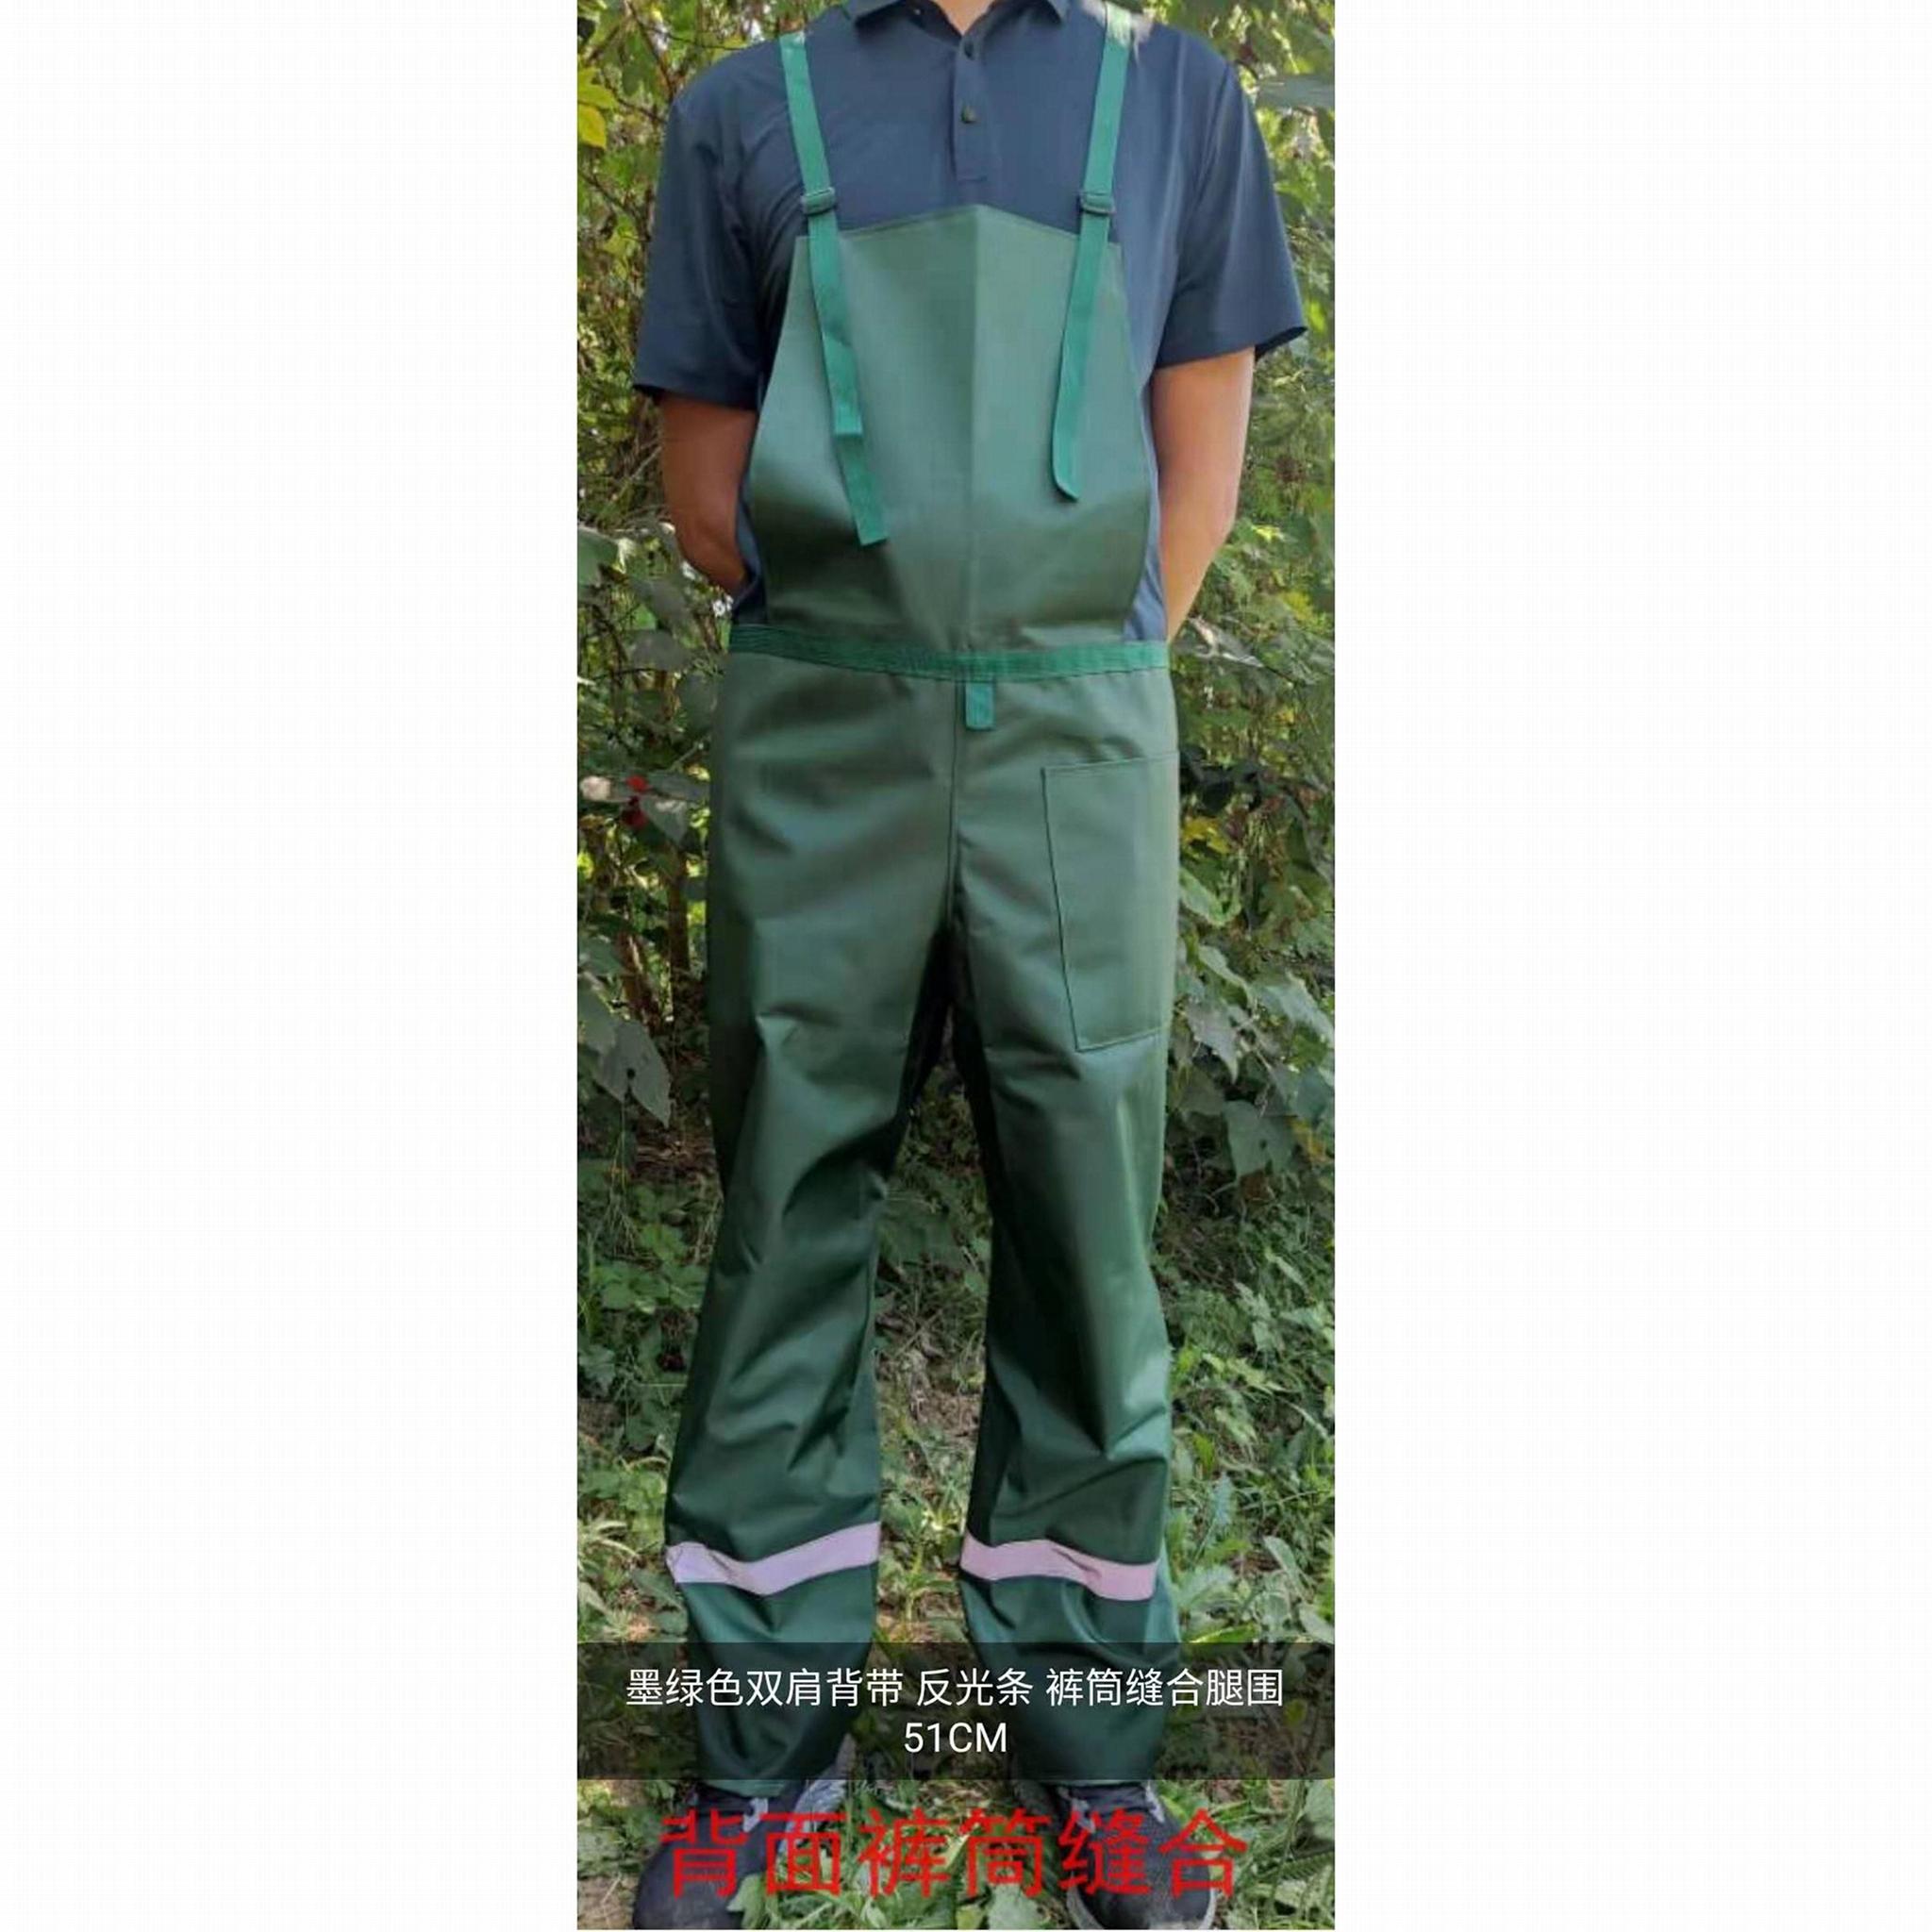 Garden work trousers